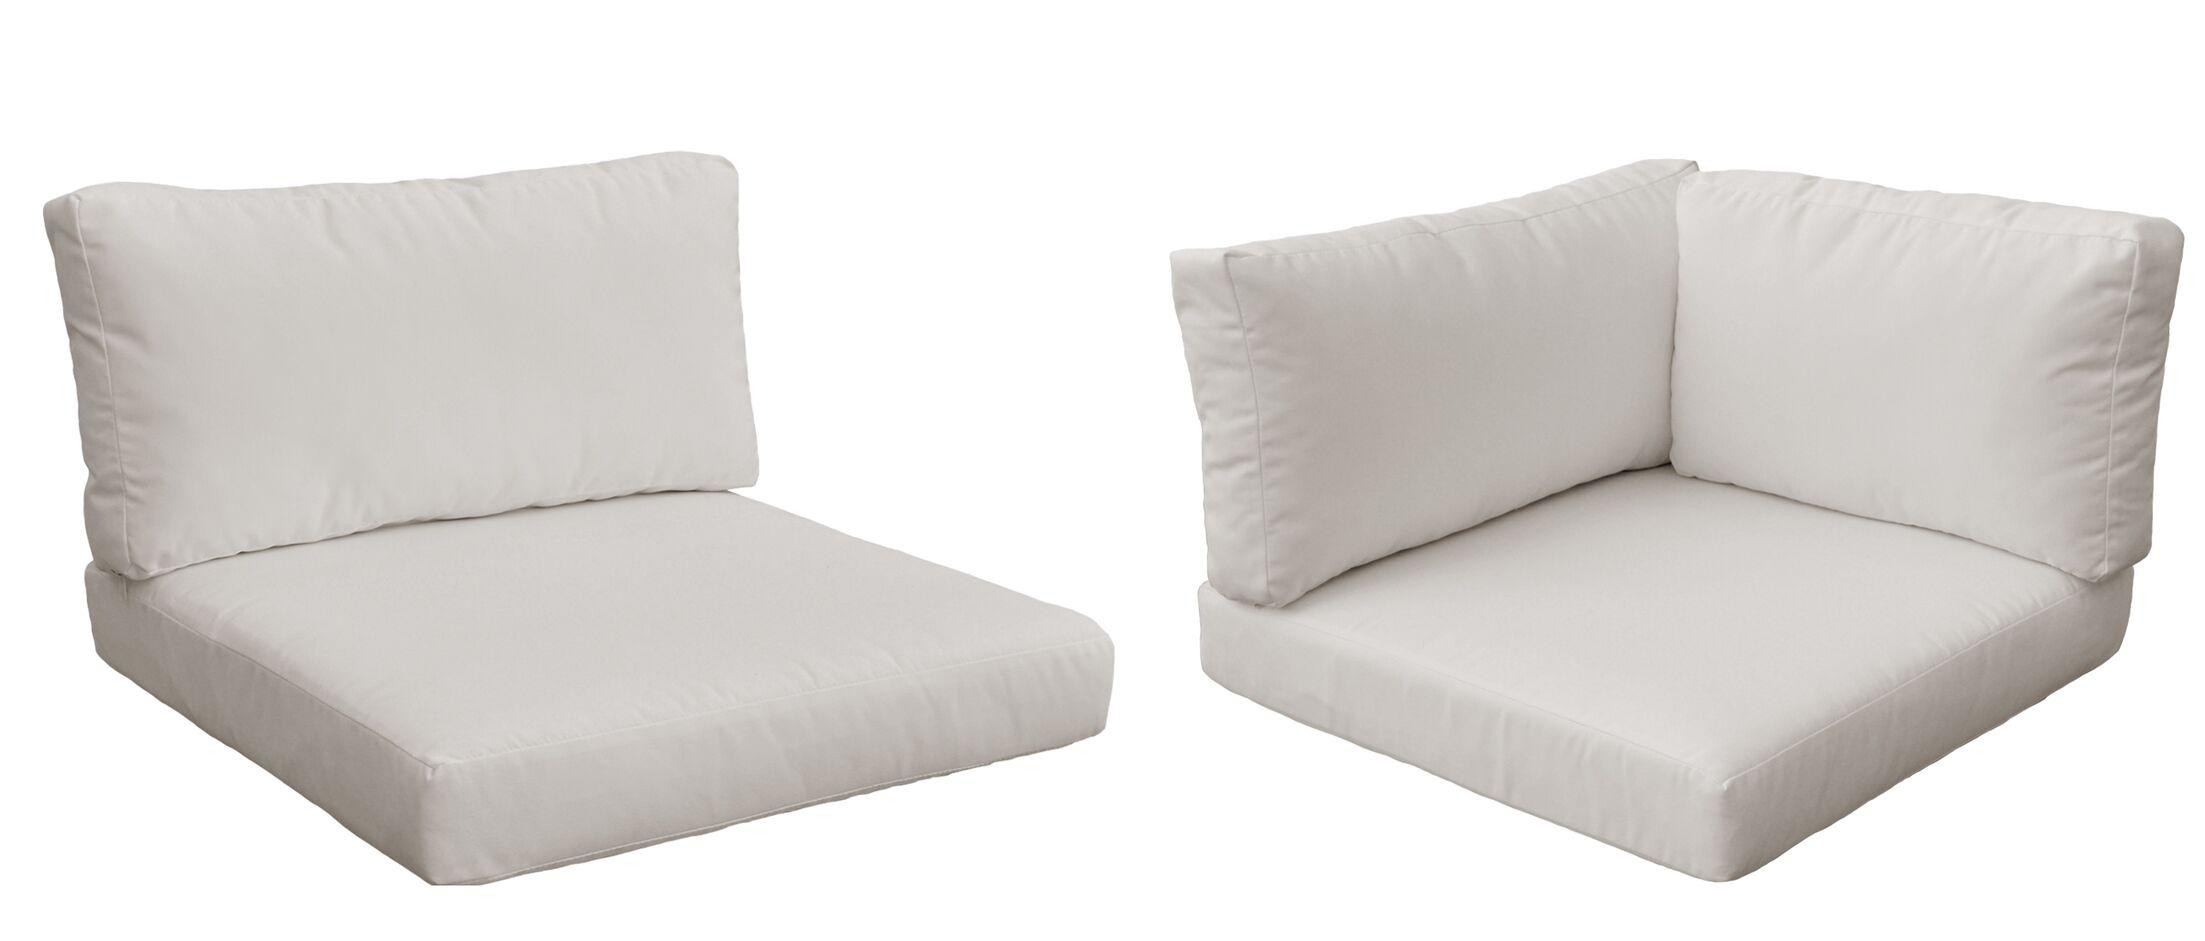 Monaco Outdoor 12 Piece Lounge Chair Cushion Set Fabric: Beige